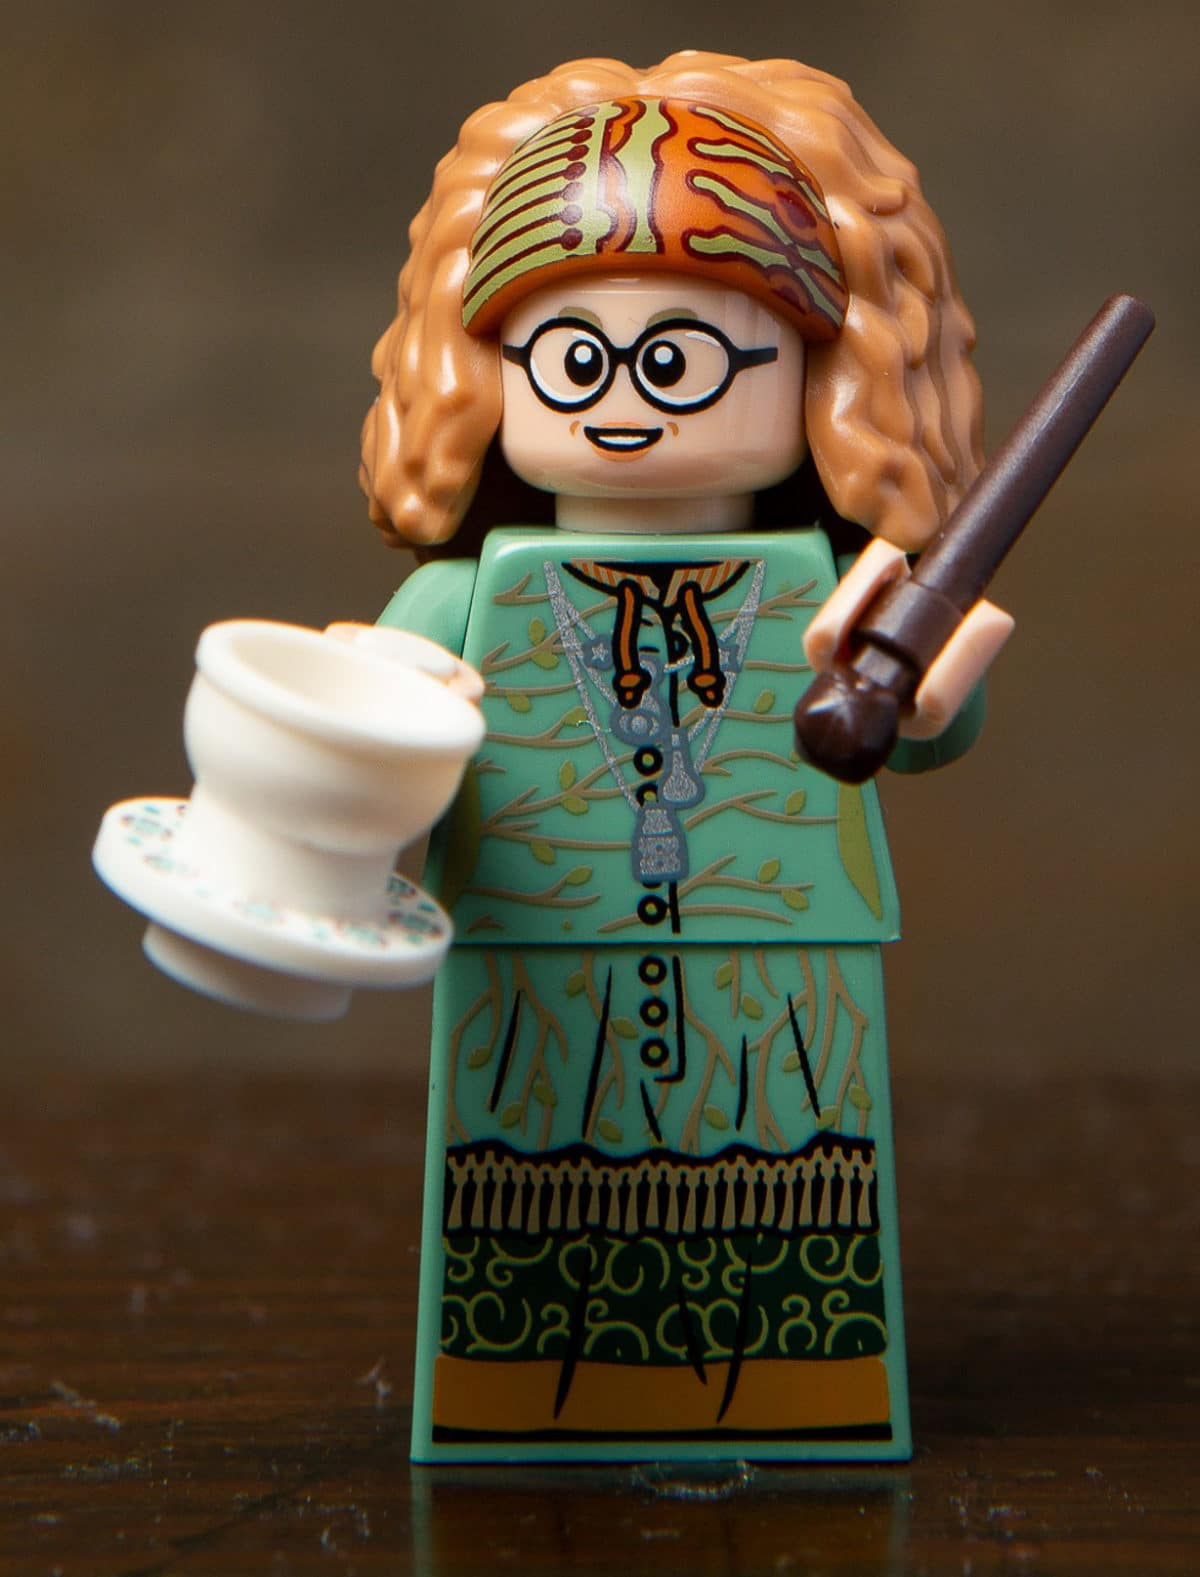 LEGO 71022 Professor Trelawney